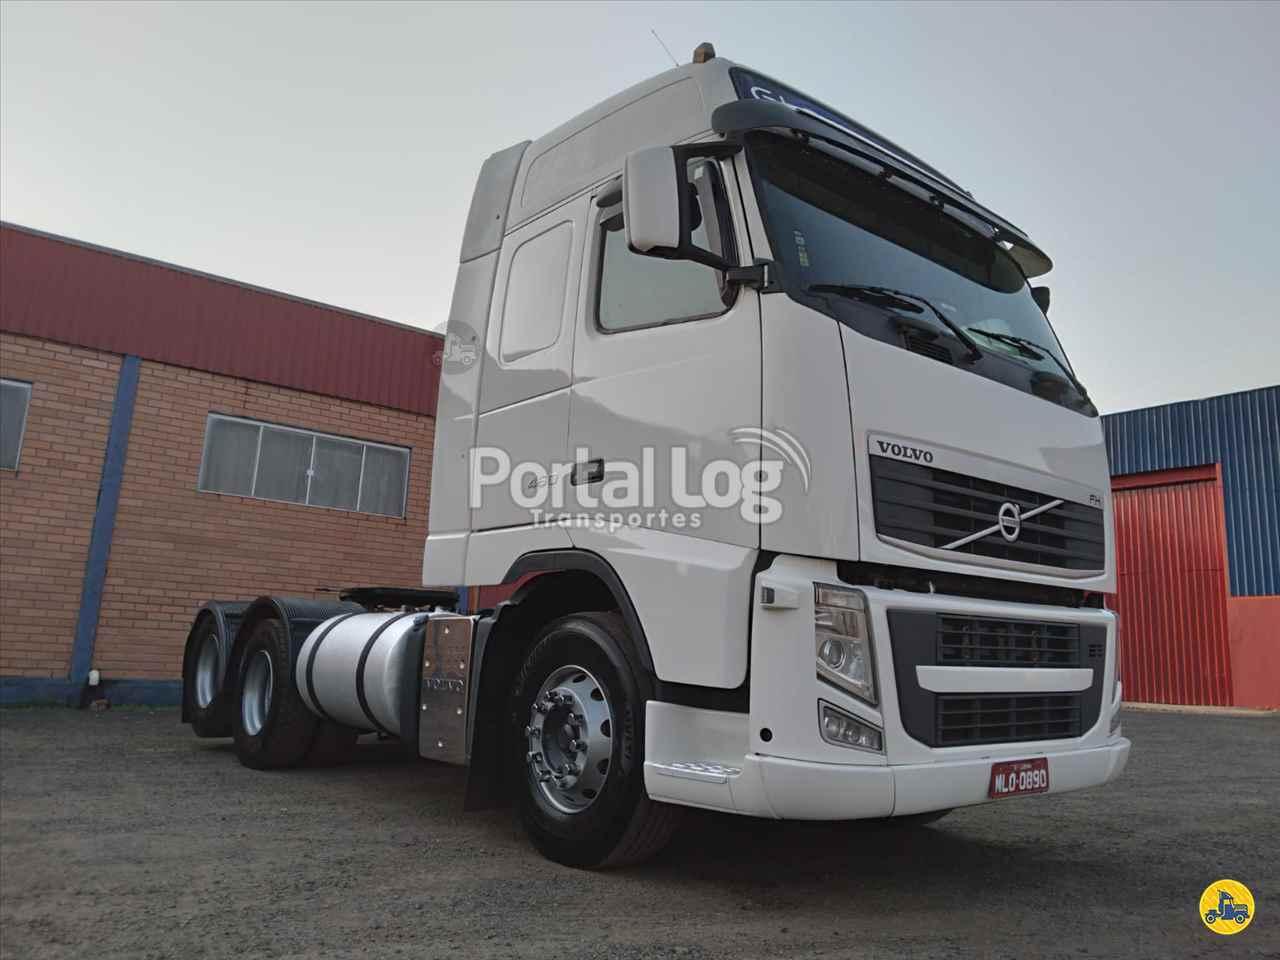 VOLVO FH 460 de Portal Log - LUZERNA/SC